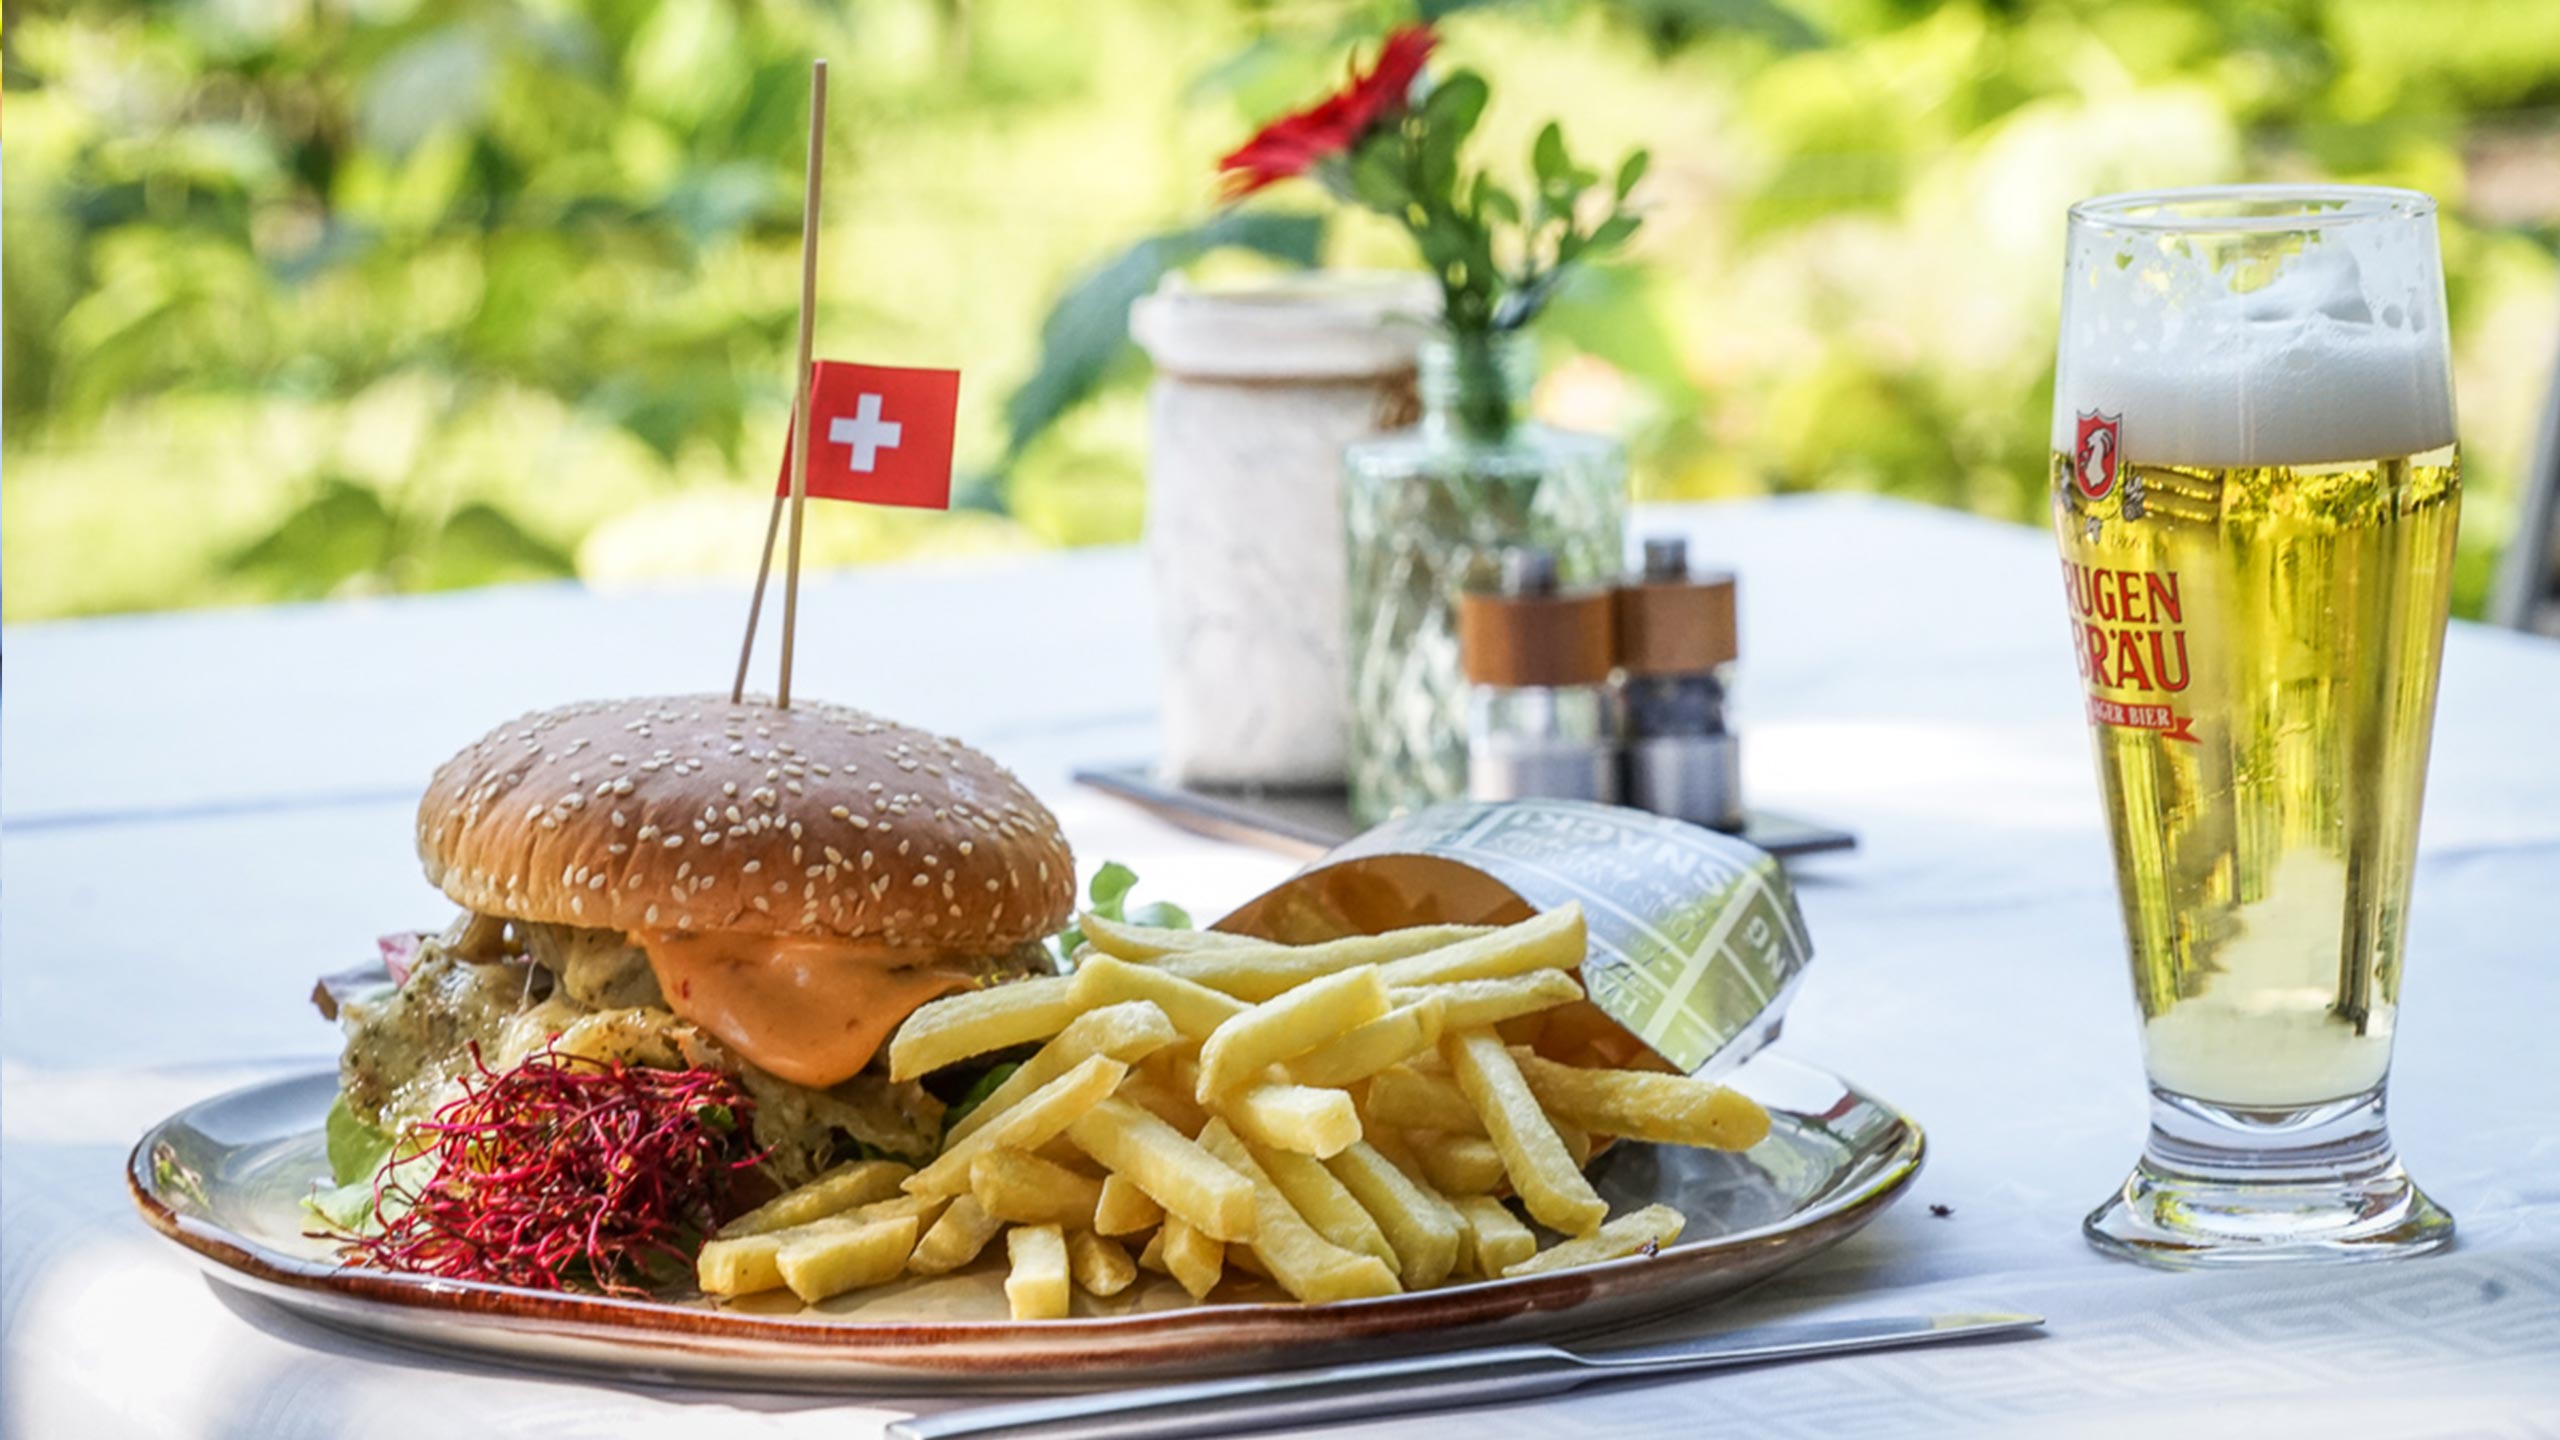 edelweiss-restaurant-wilderswil-burger-pommes-bier.jpg